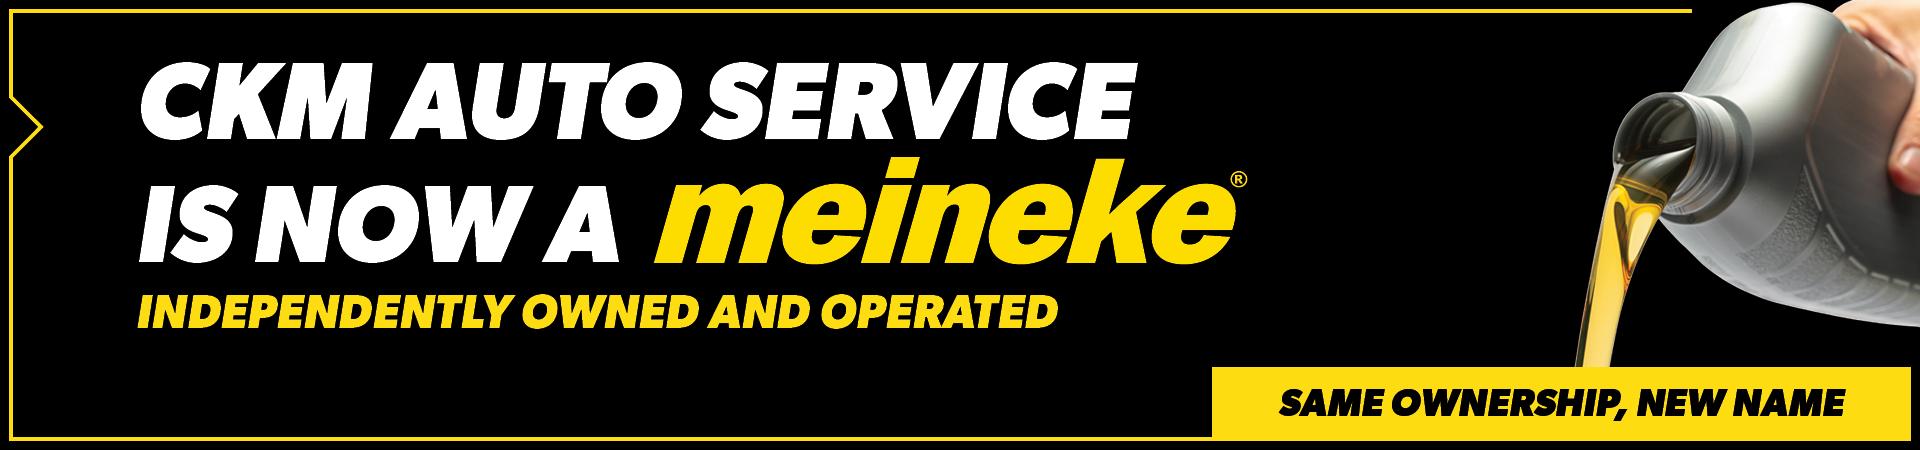 CKM Auto Service is now a Meineke